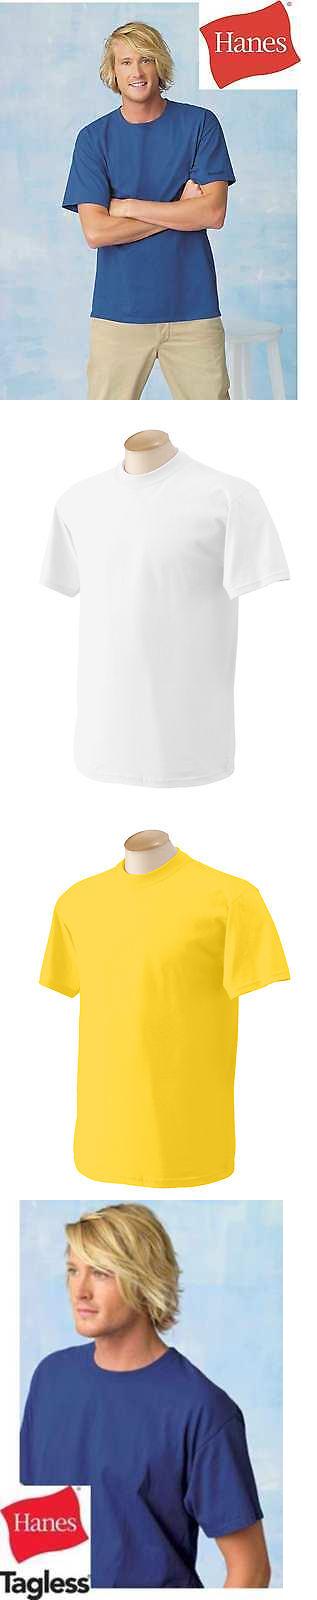 Shirts 50976: Blank Hanes Tagless 6.Oz T-Shirt Plain Wholesale Bulk Lot Colors S-Xl 5250 -> BUY IT NOW ONLY: $257 on eBay!